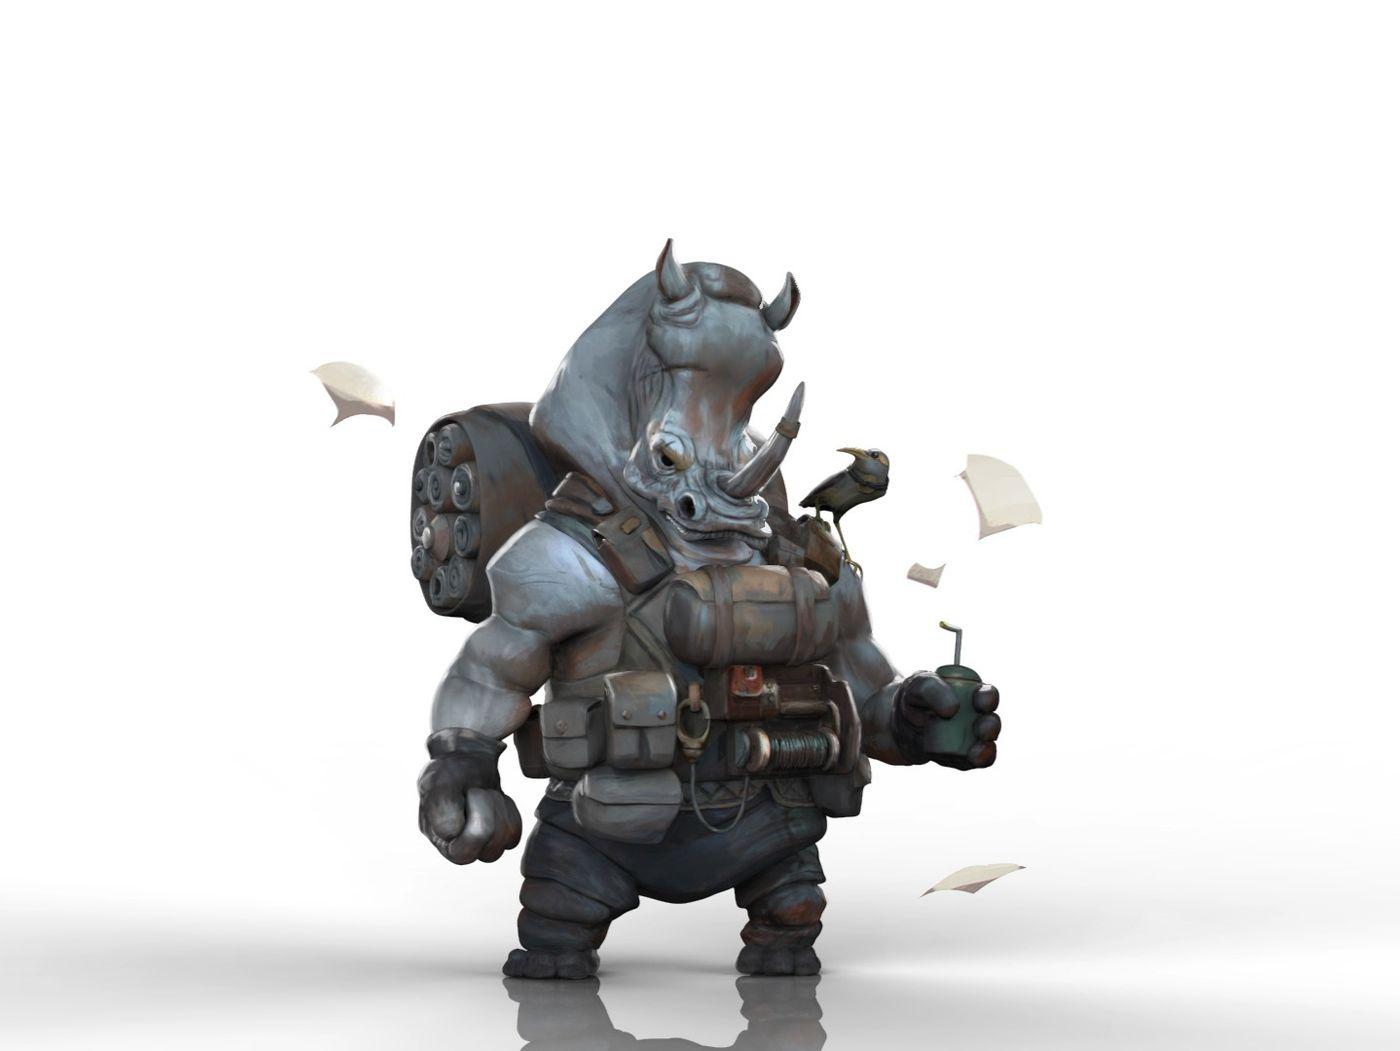 Rhino digital sculpture